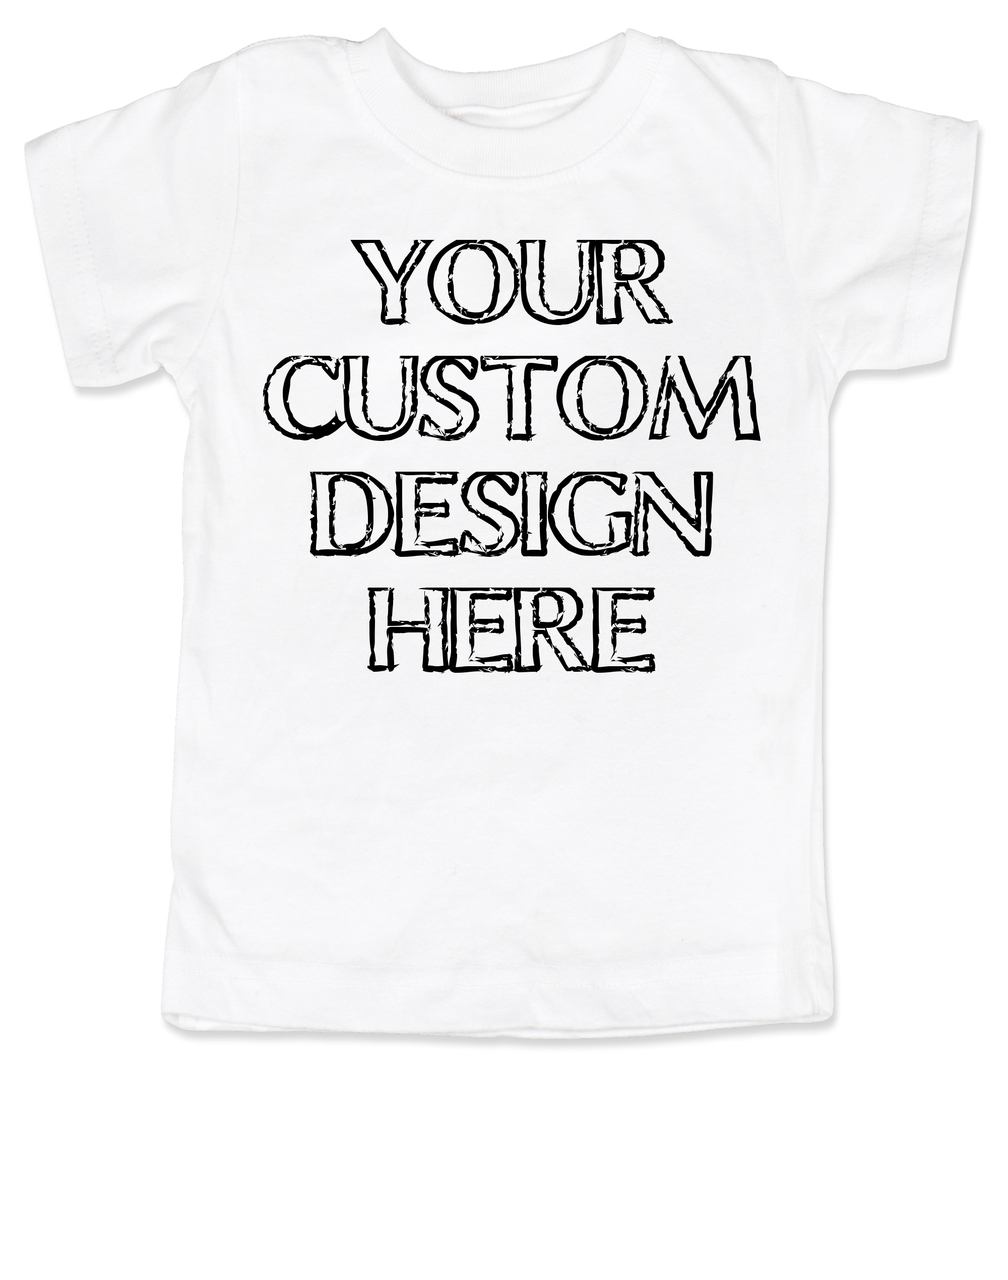 b2dcfd20e Make Your Own Custom Toddler Shirt